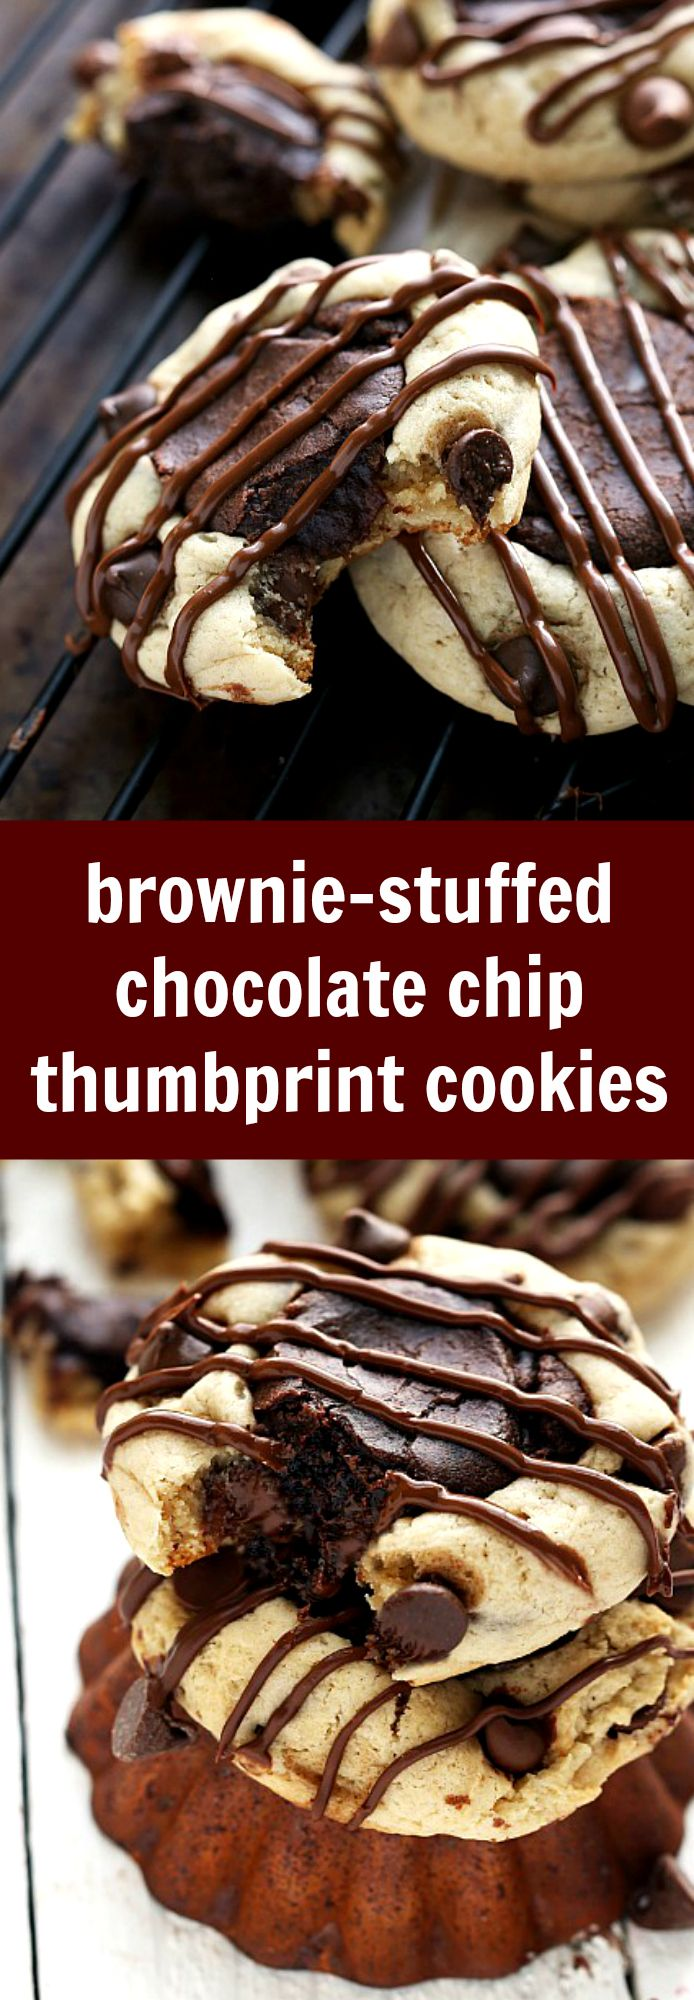 Creative cookie recipes ideas